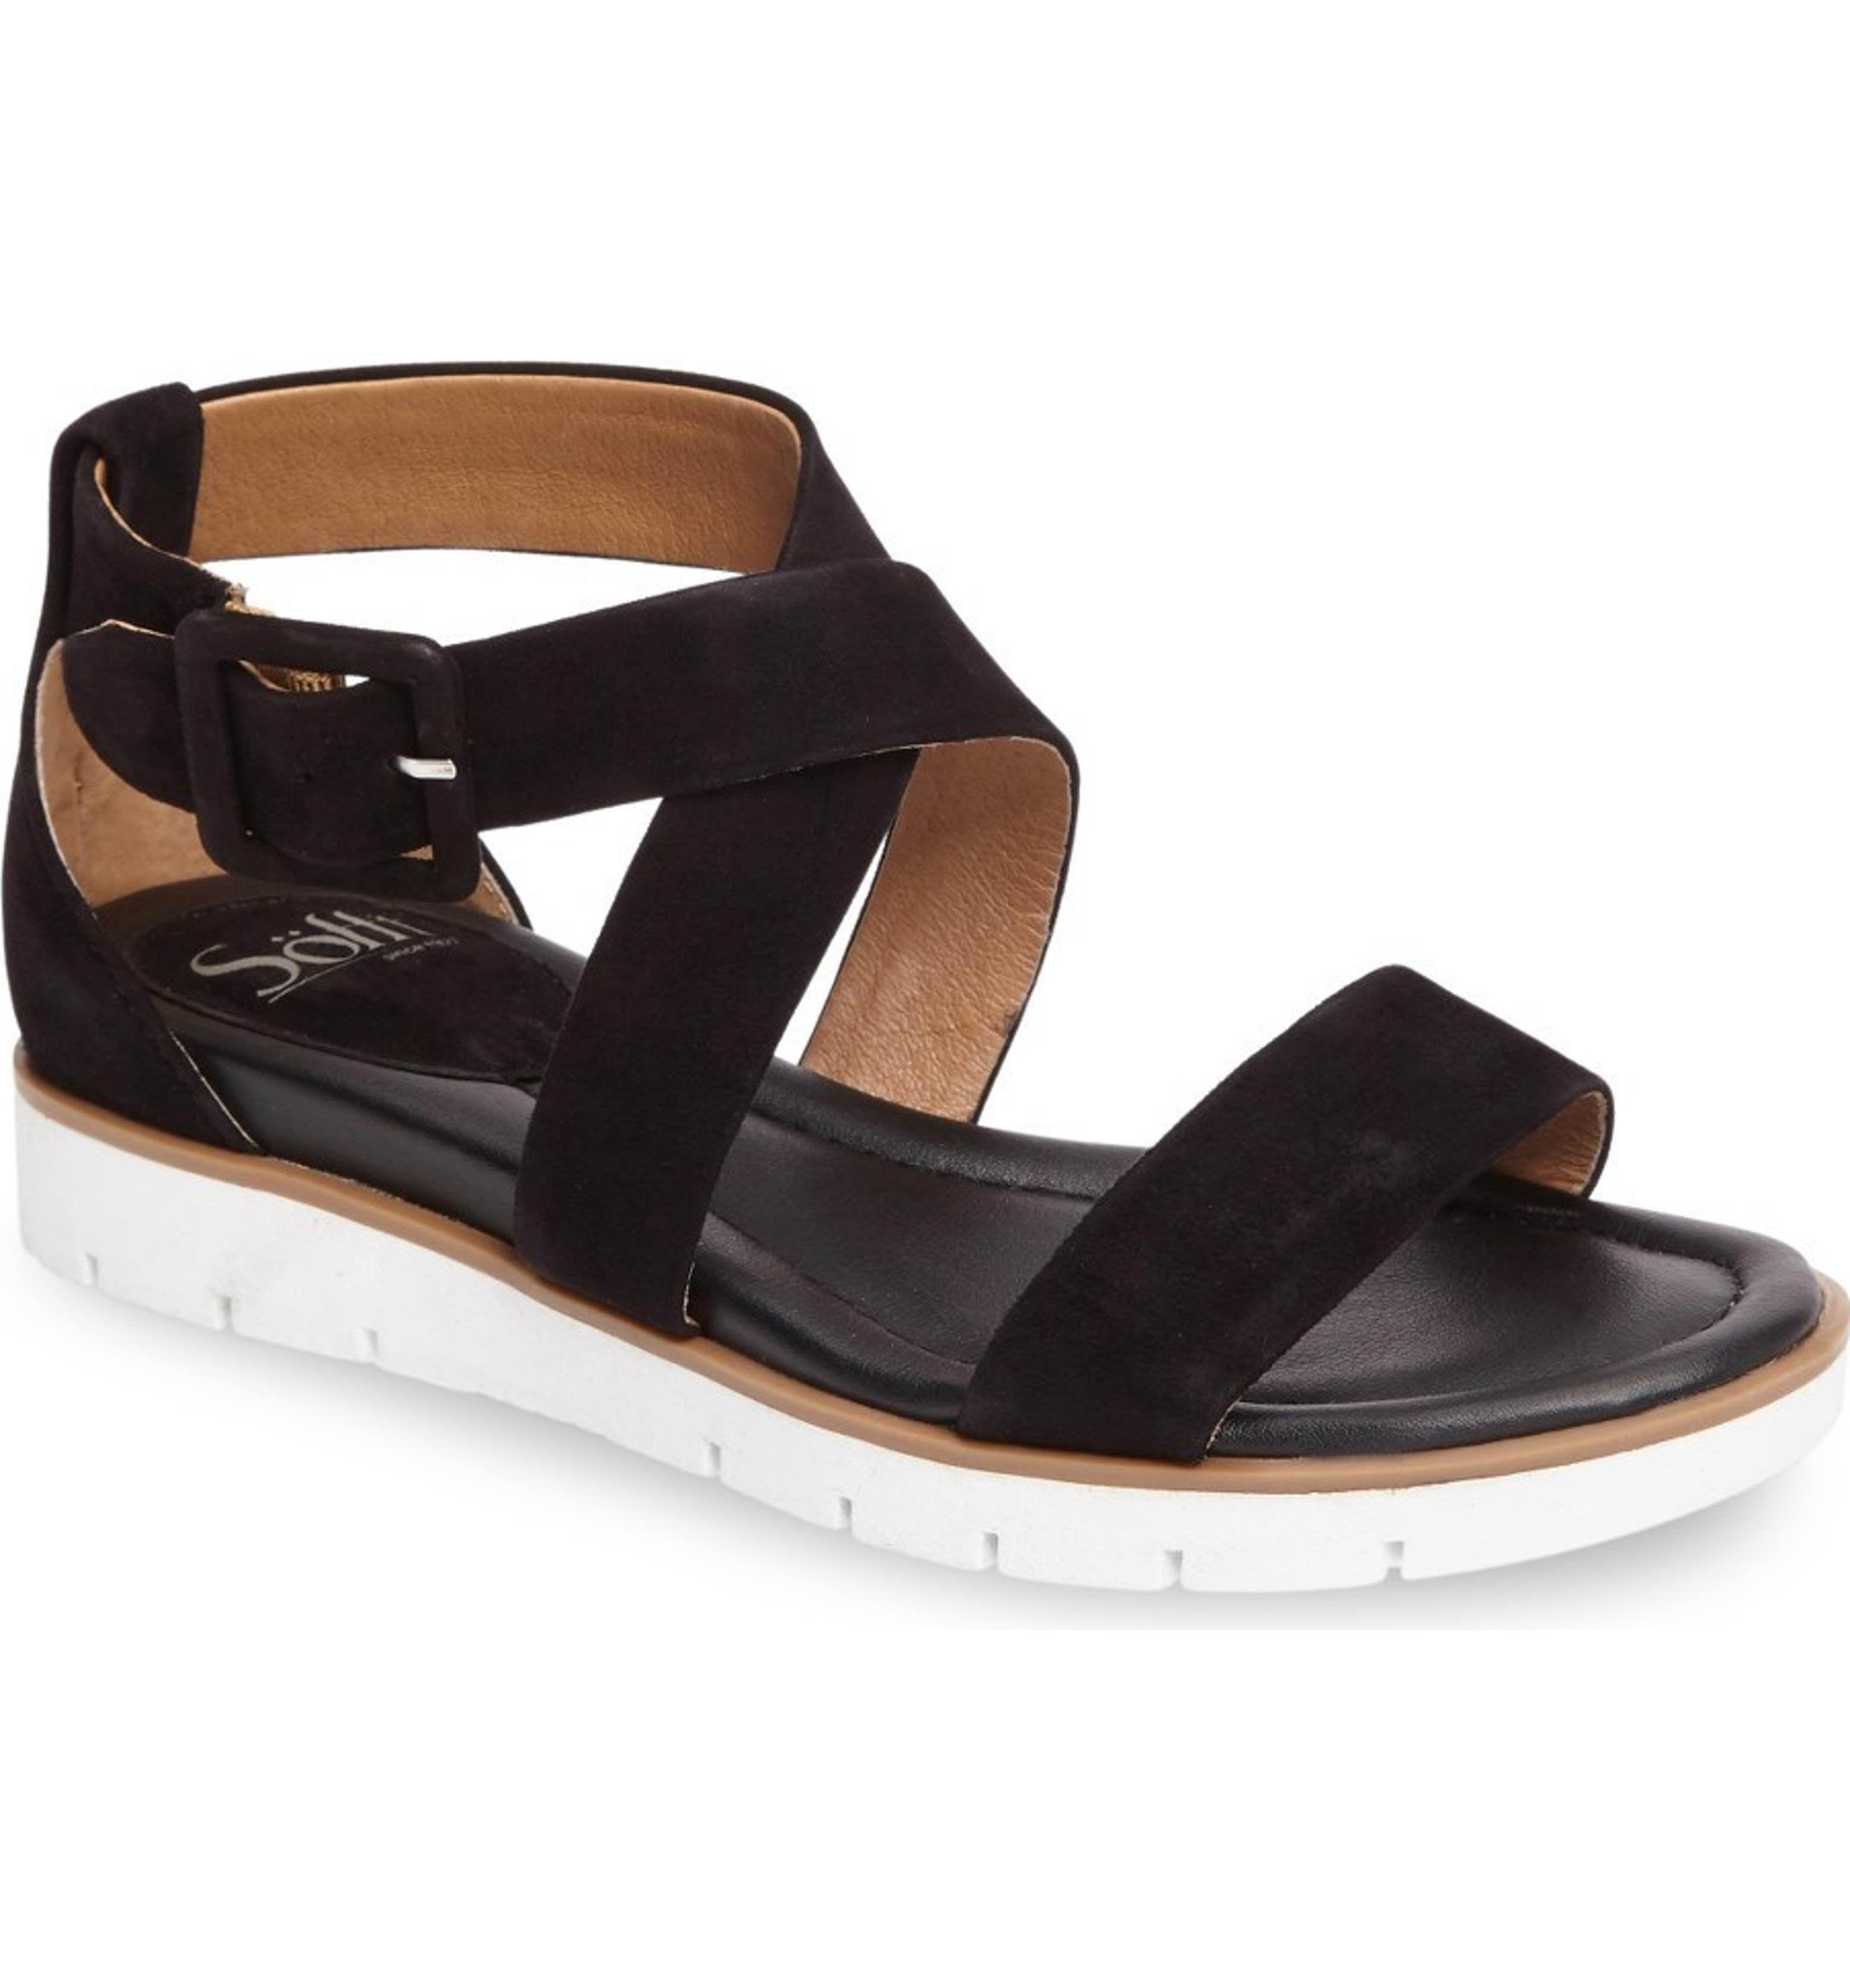 Main Image - Söfft Mira Ankle Strap Sandal (Women)